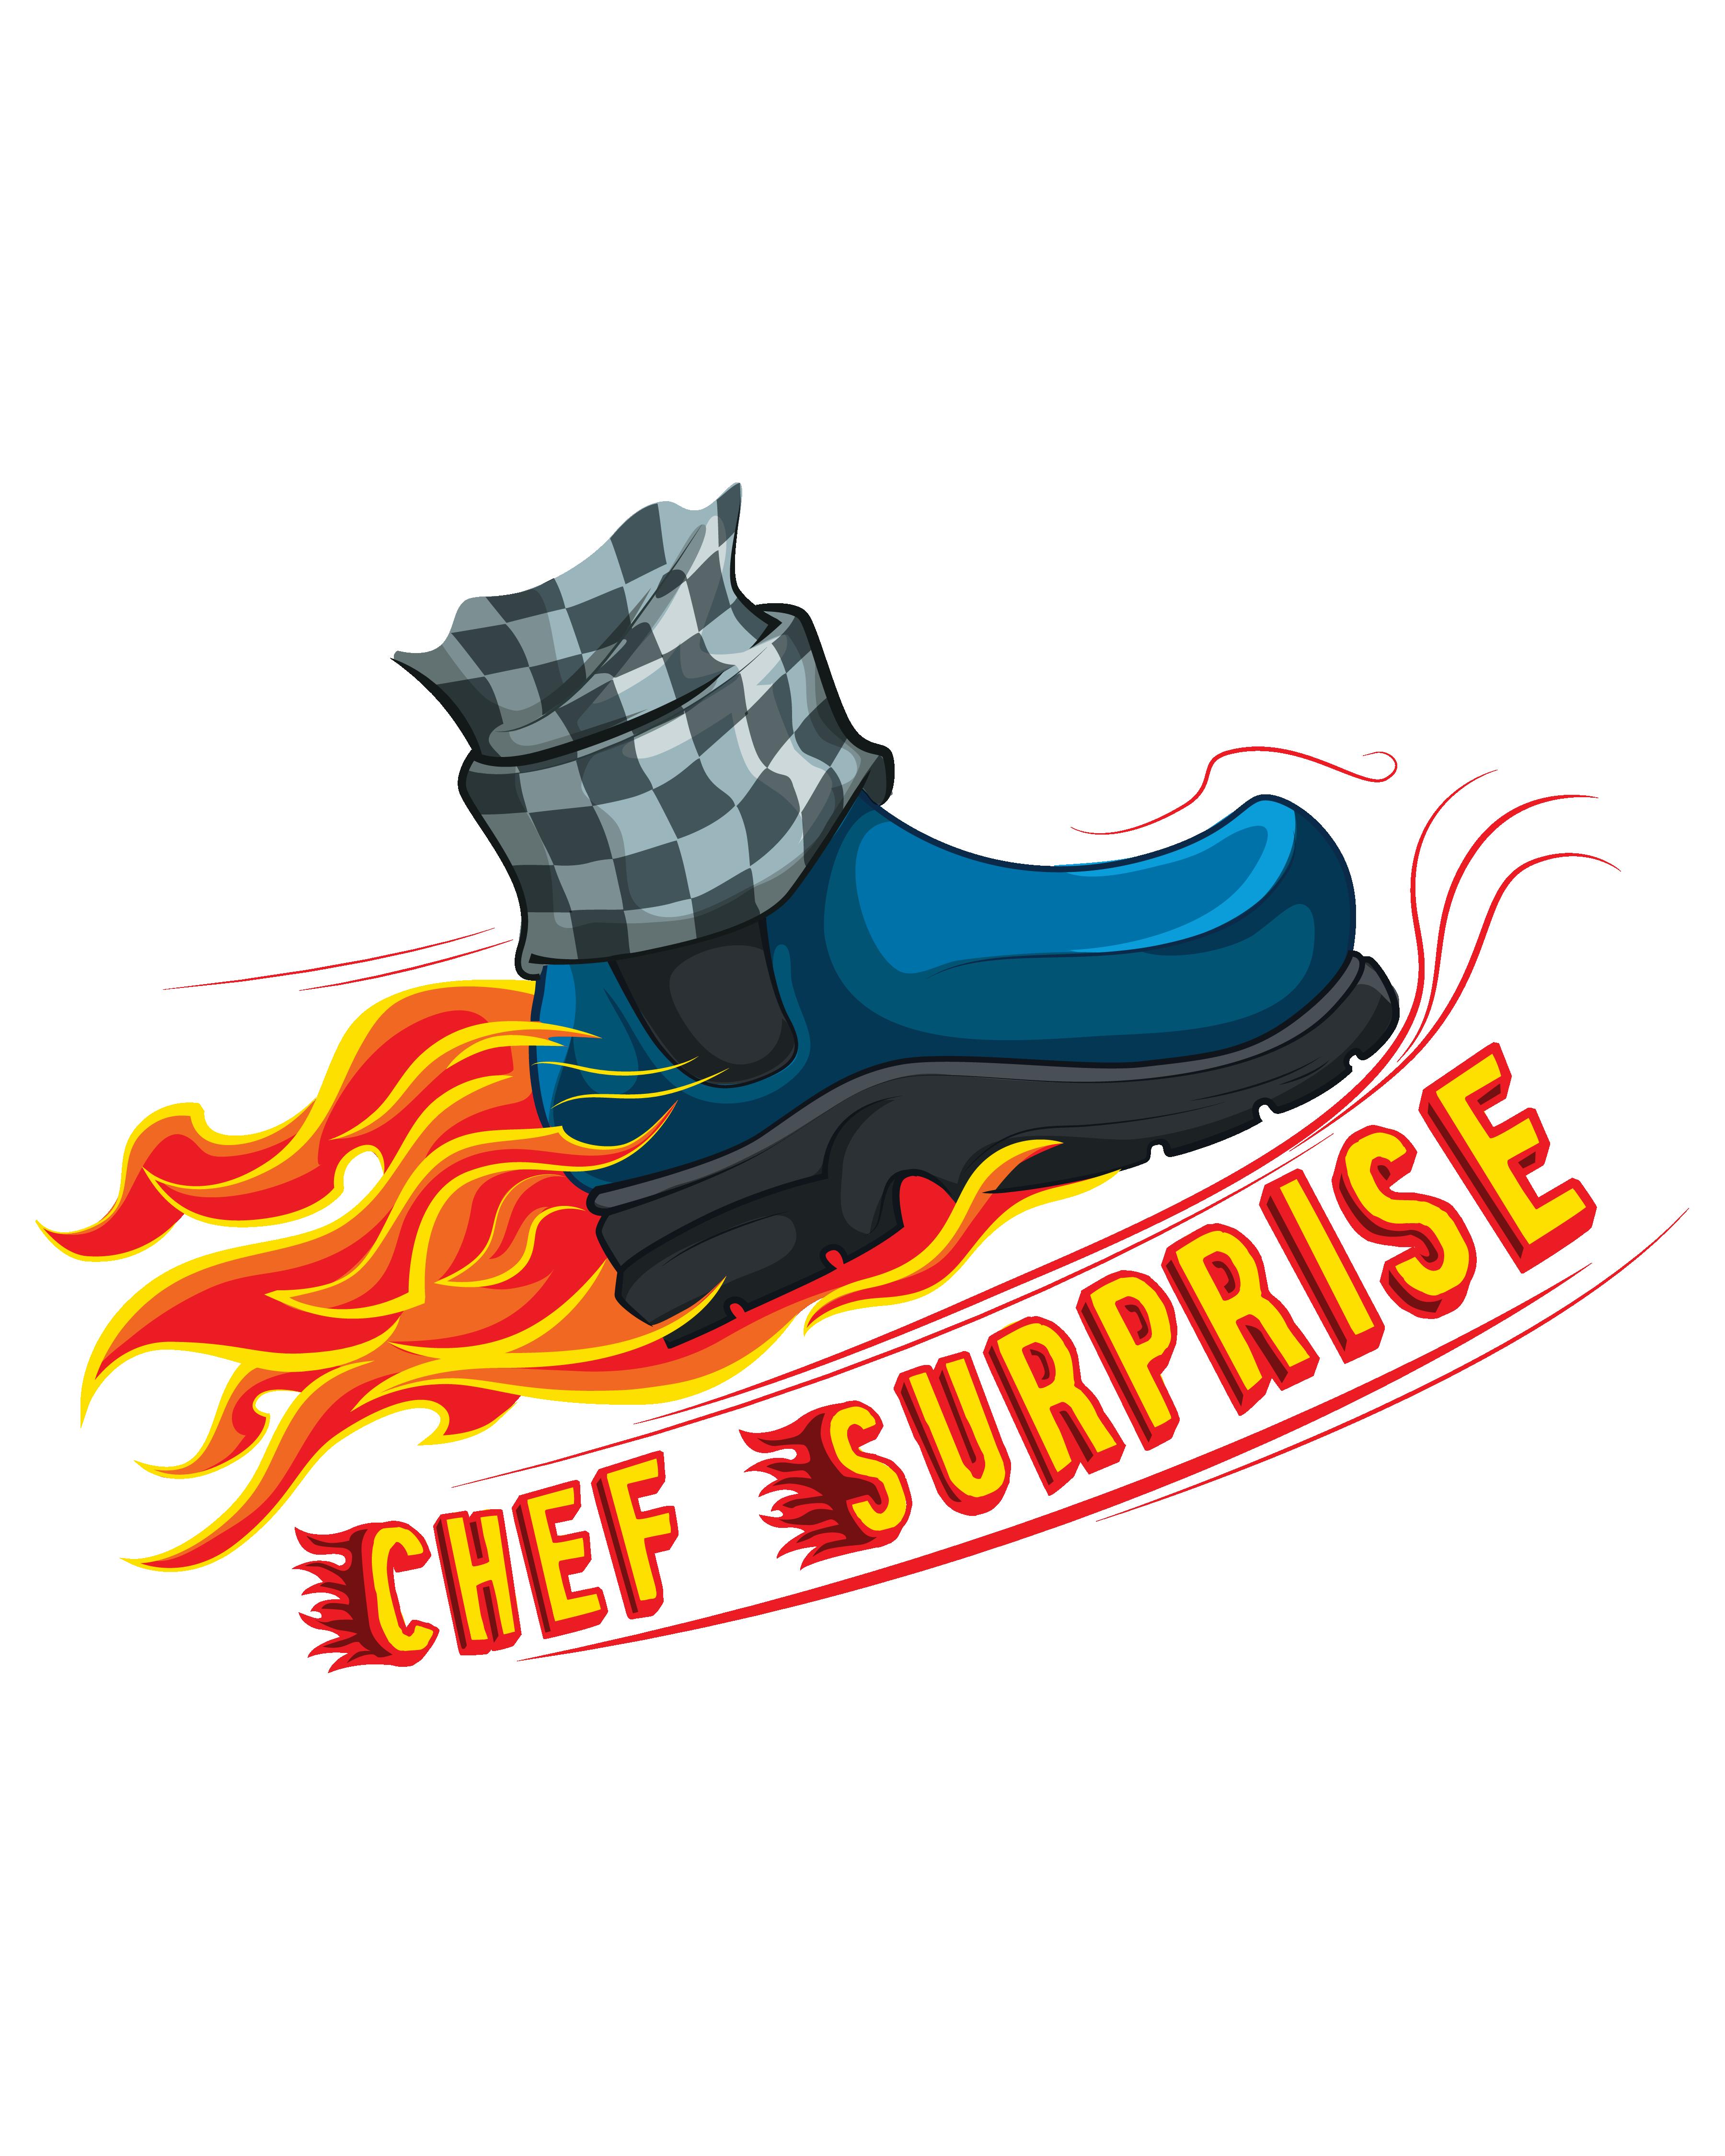 Chefsurprise